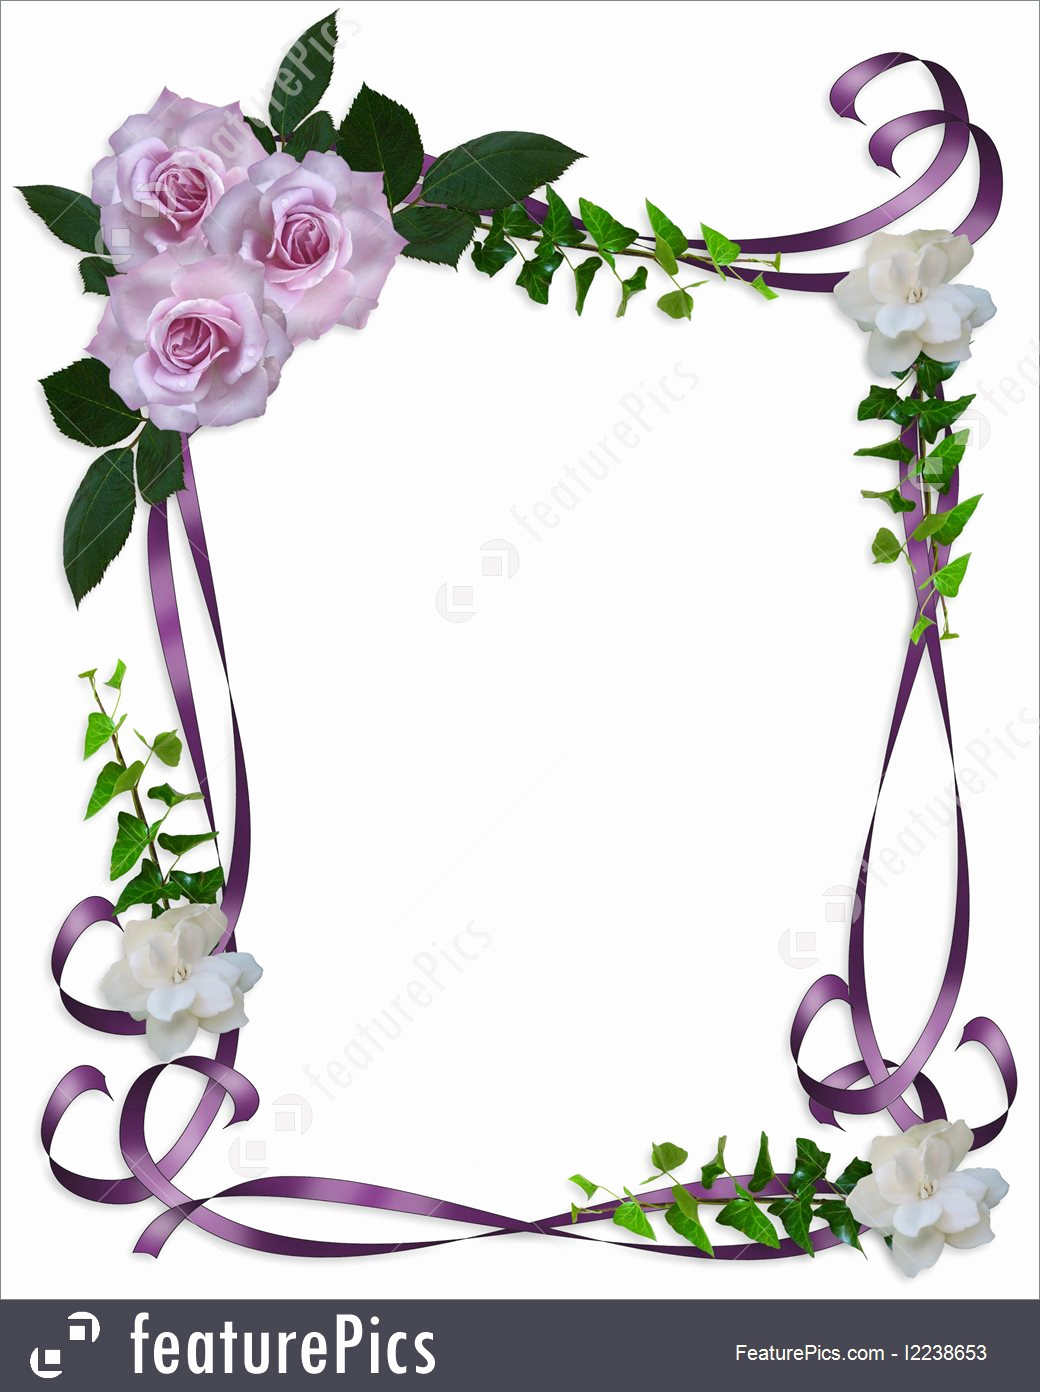 Wedding Invitation Border Designs New Illustration Roses Wedding Invitation Border